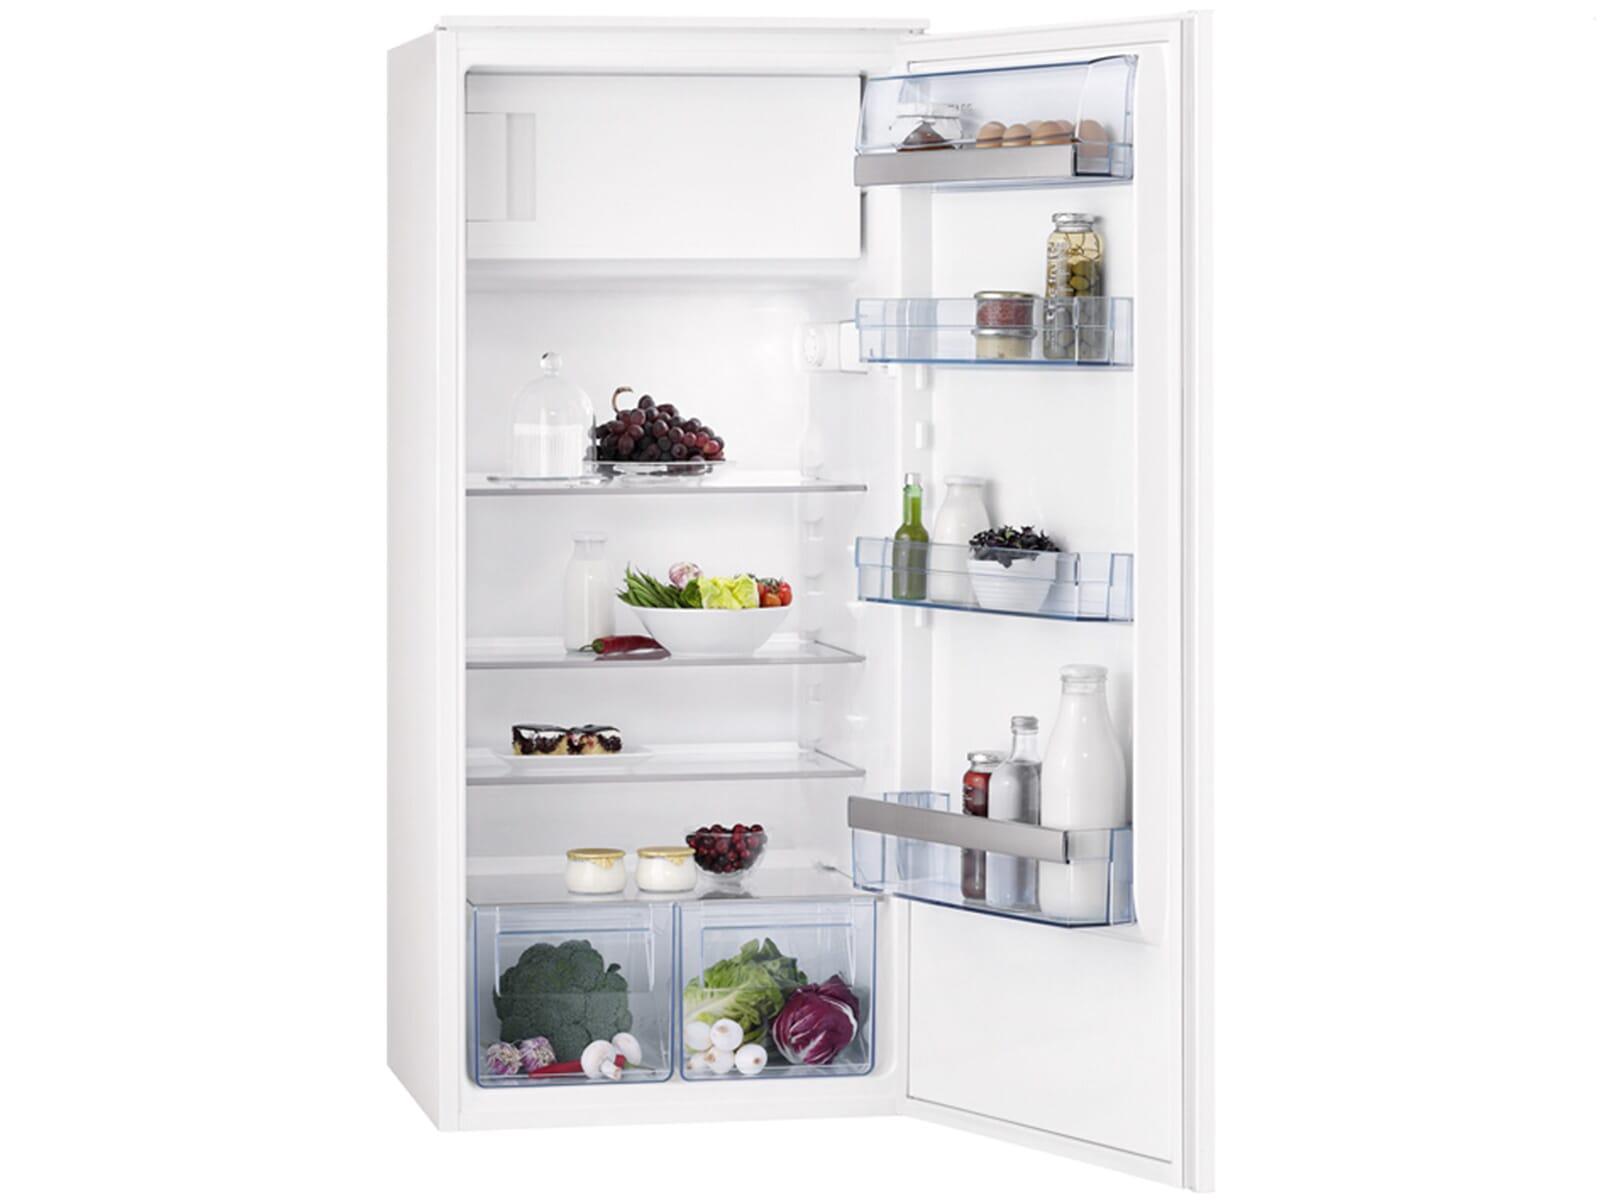 Smeg Kühlschrank Zu Kalt : Temperatur kühlschrank mcadams kara blog